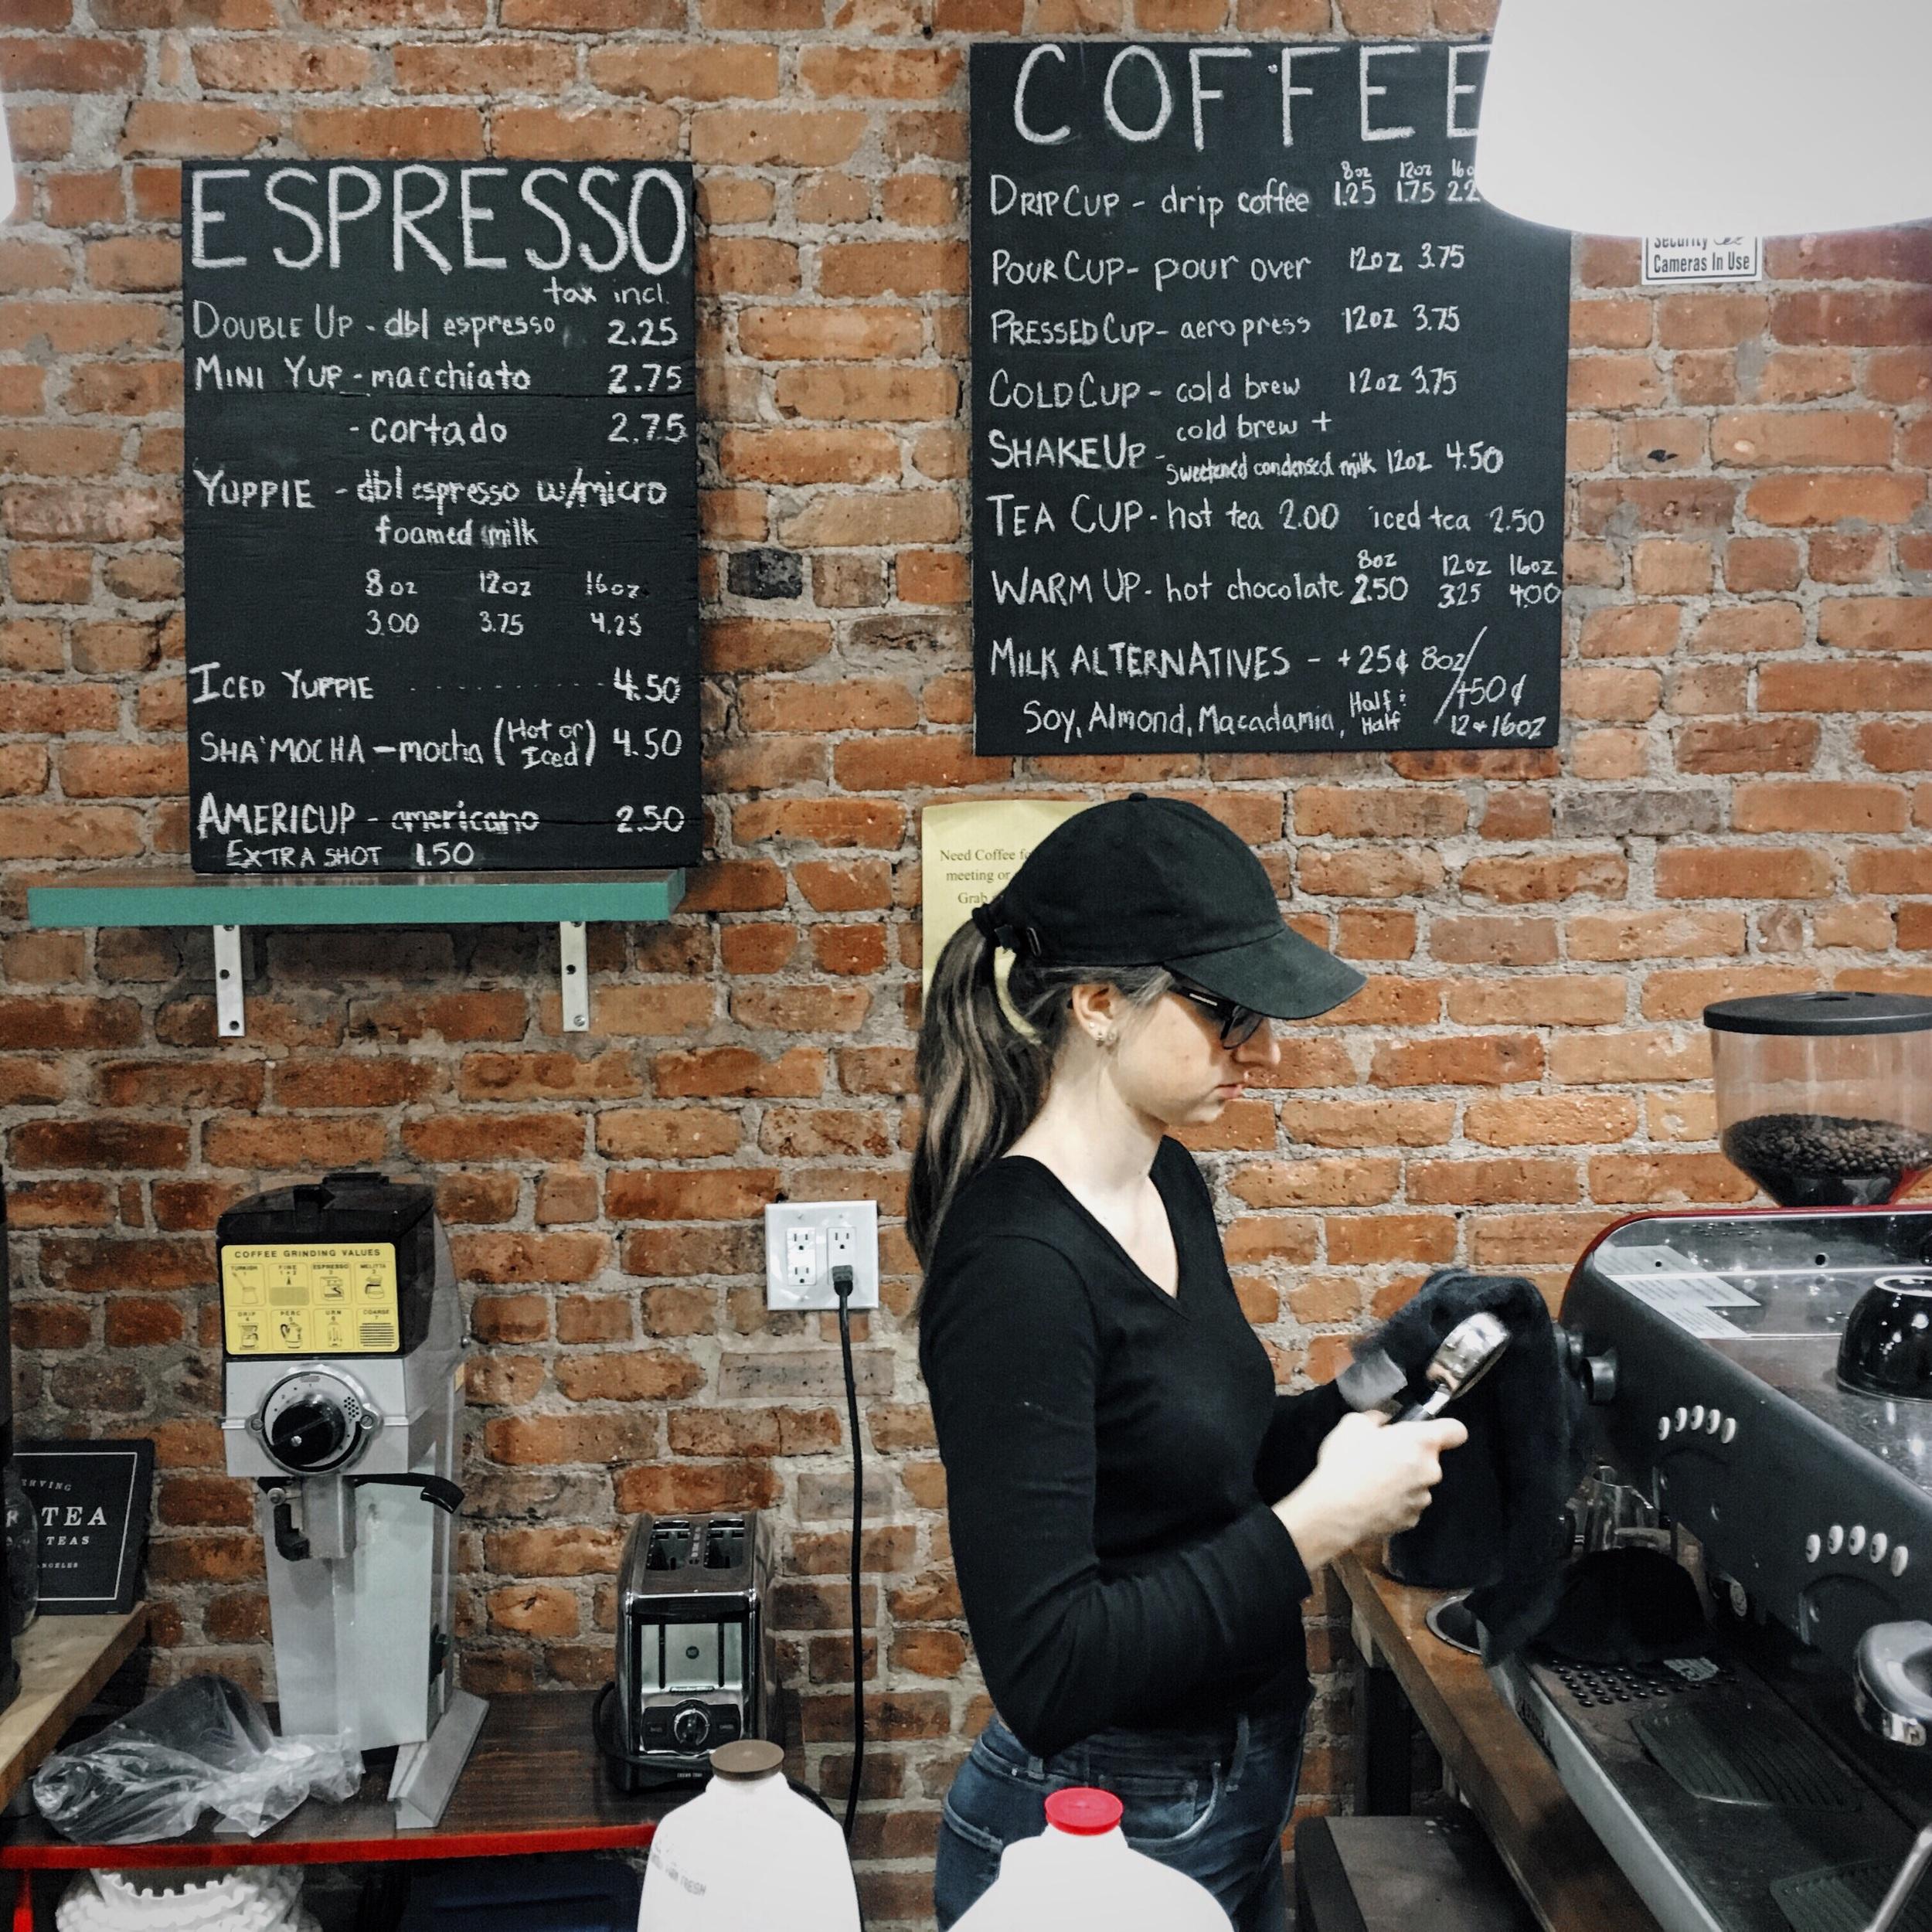 harlem_uptown_coffee_shop.jpg